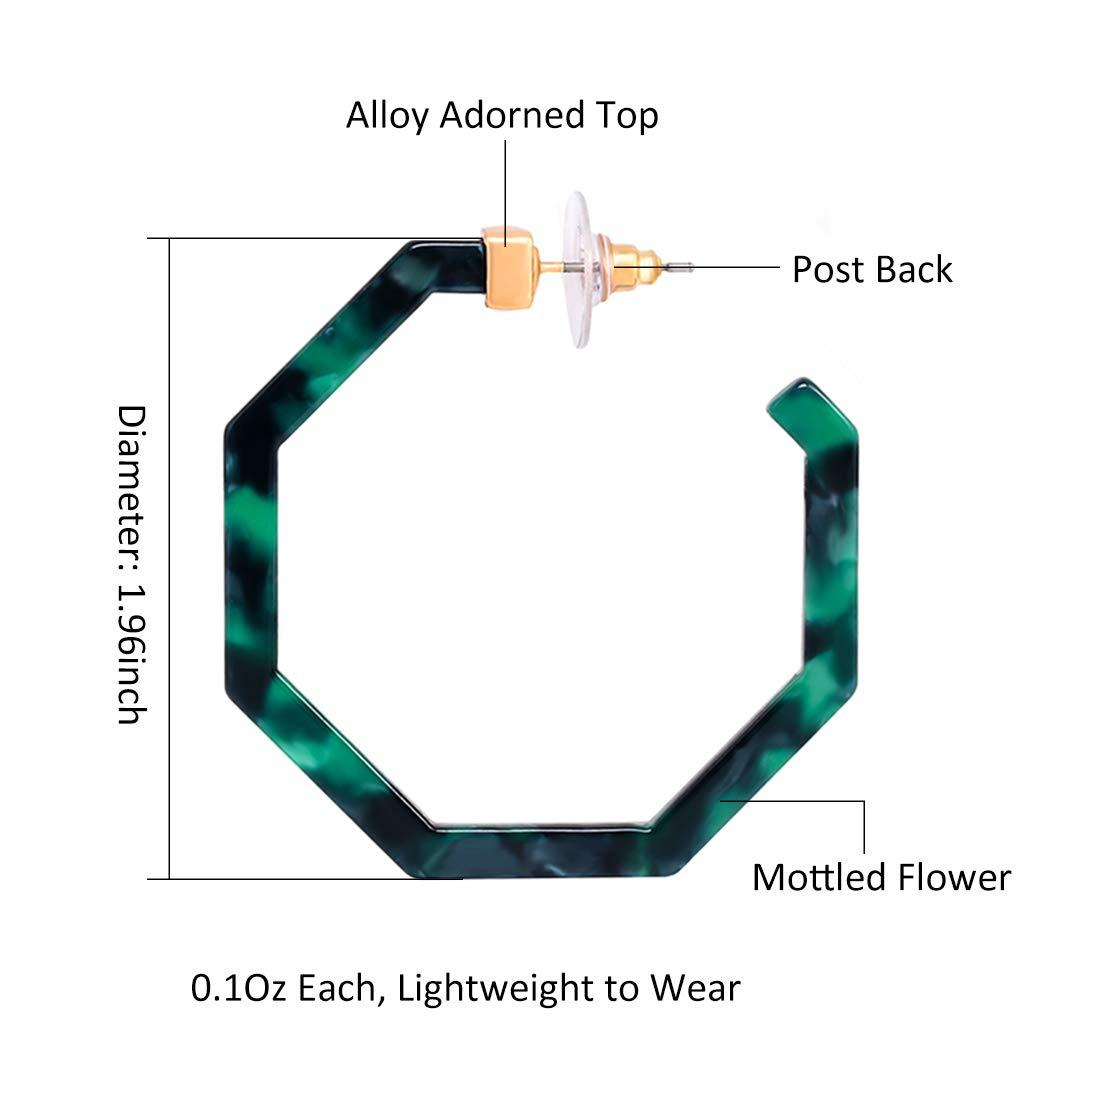 PHALIN Acrylic Hoop Earrings Tortoiseshell Acrylic Earrings Geometric Resin Earring Studs for Women Girls